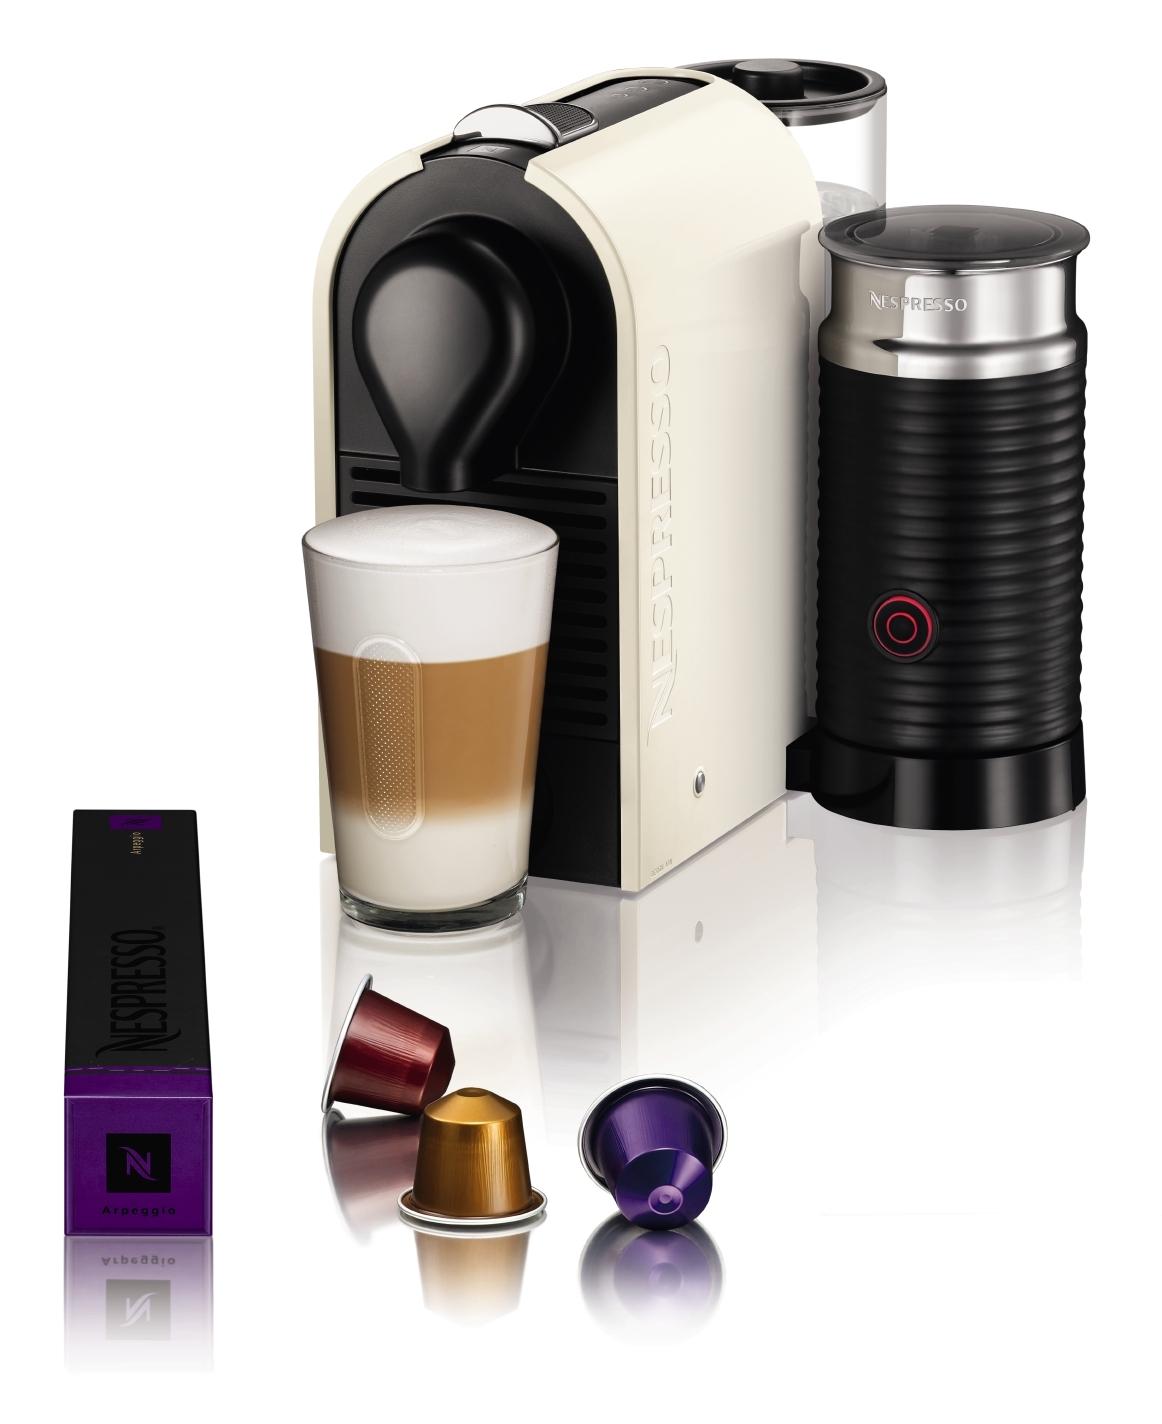 NESPRESSO Krups U XN260110 - Automatic coffee machine Alzashop.com